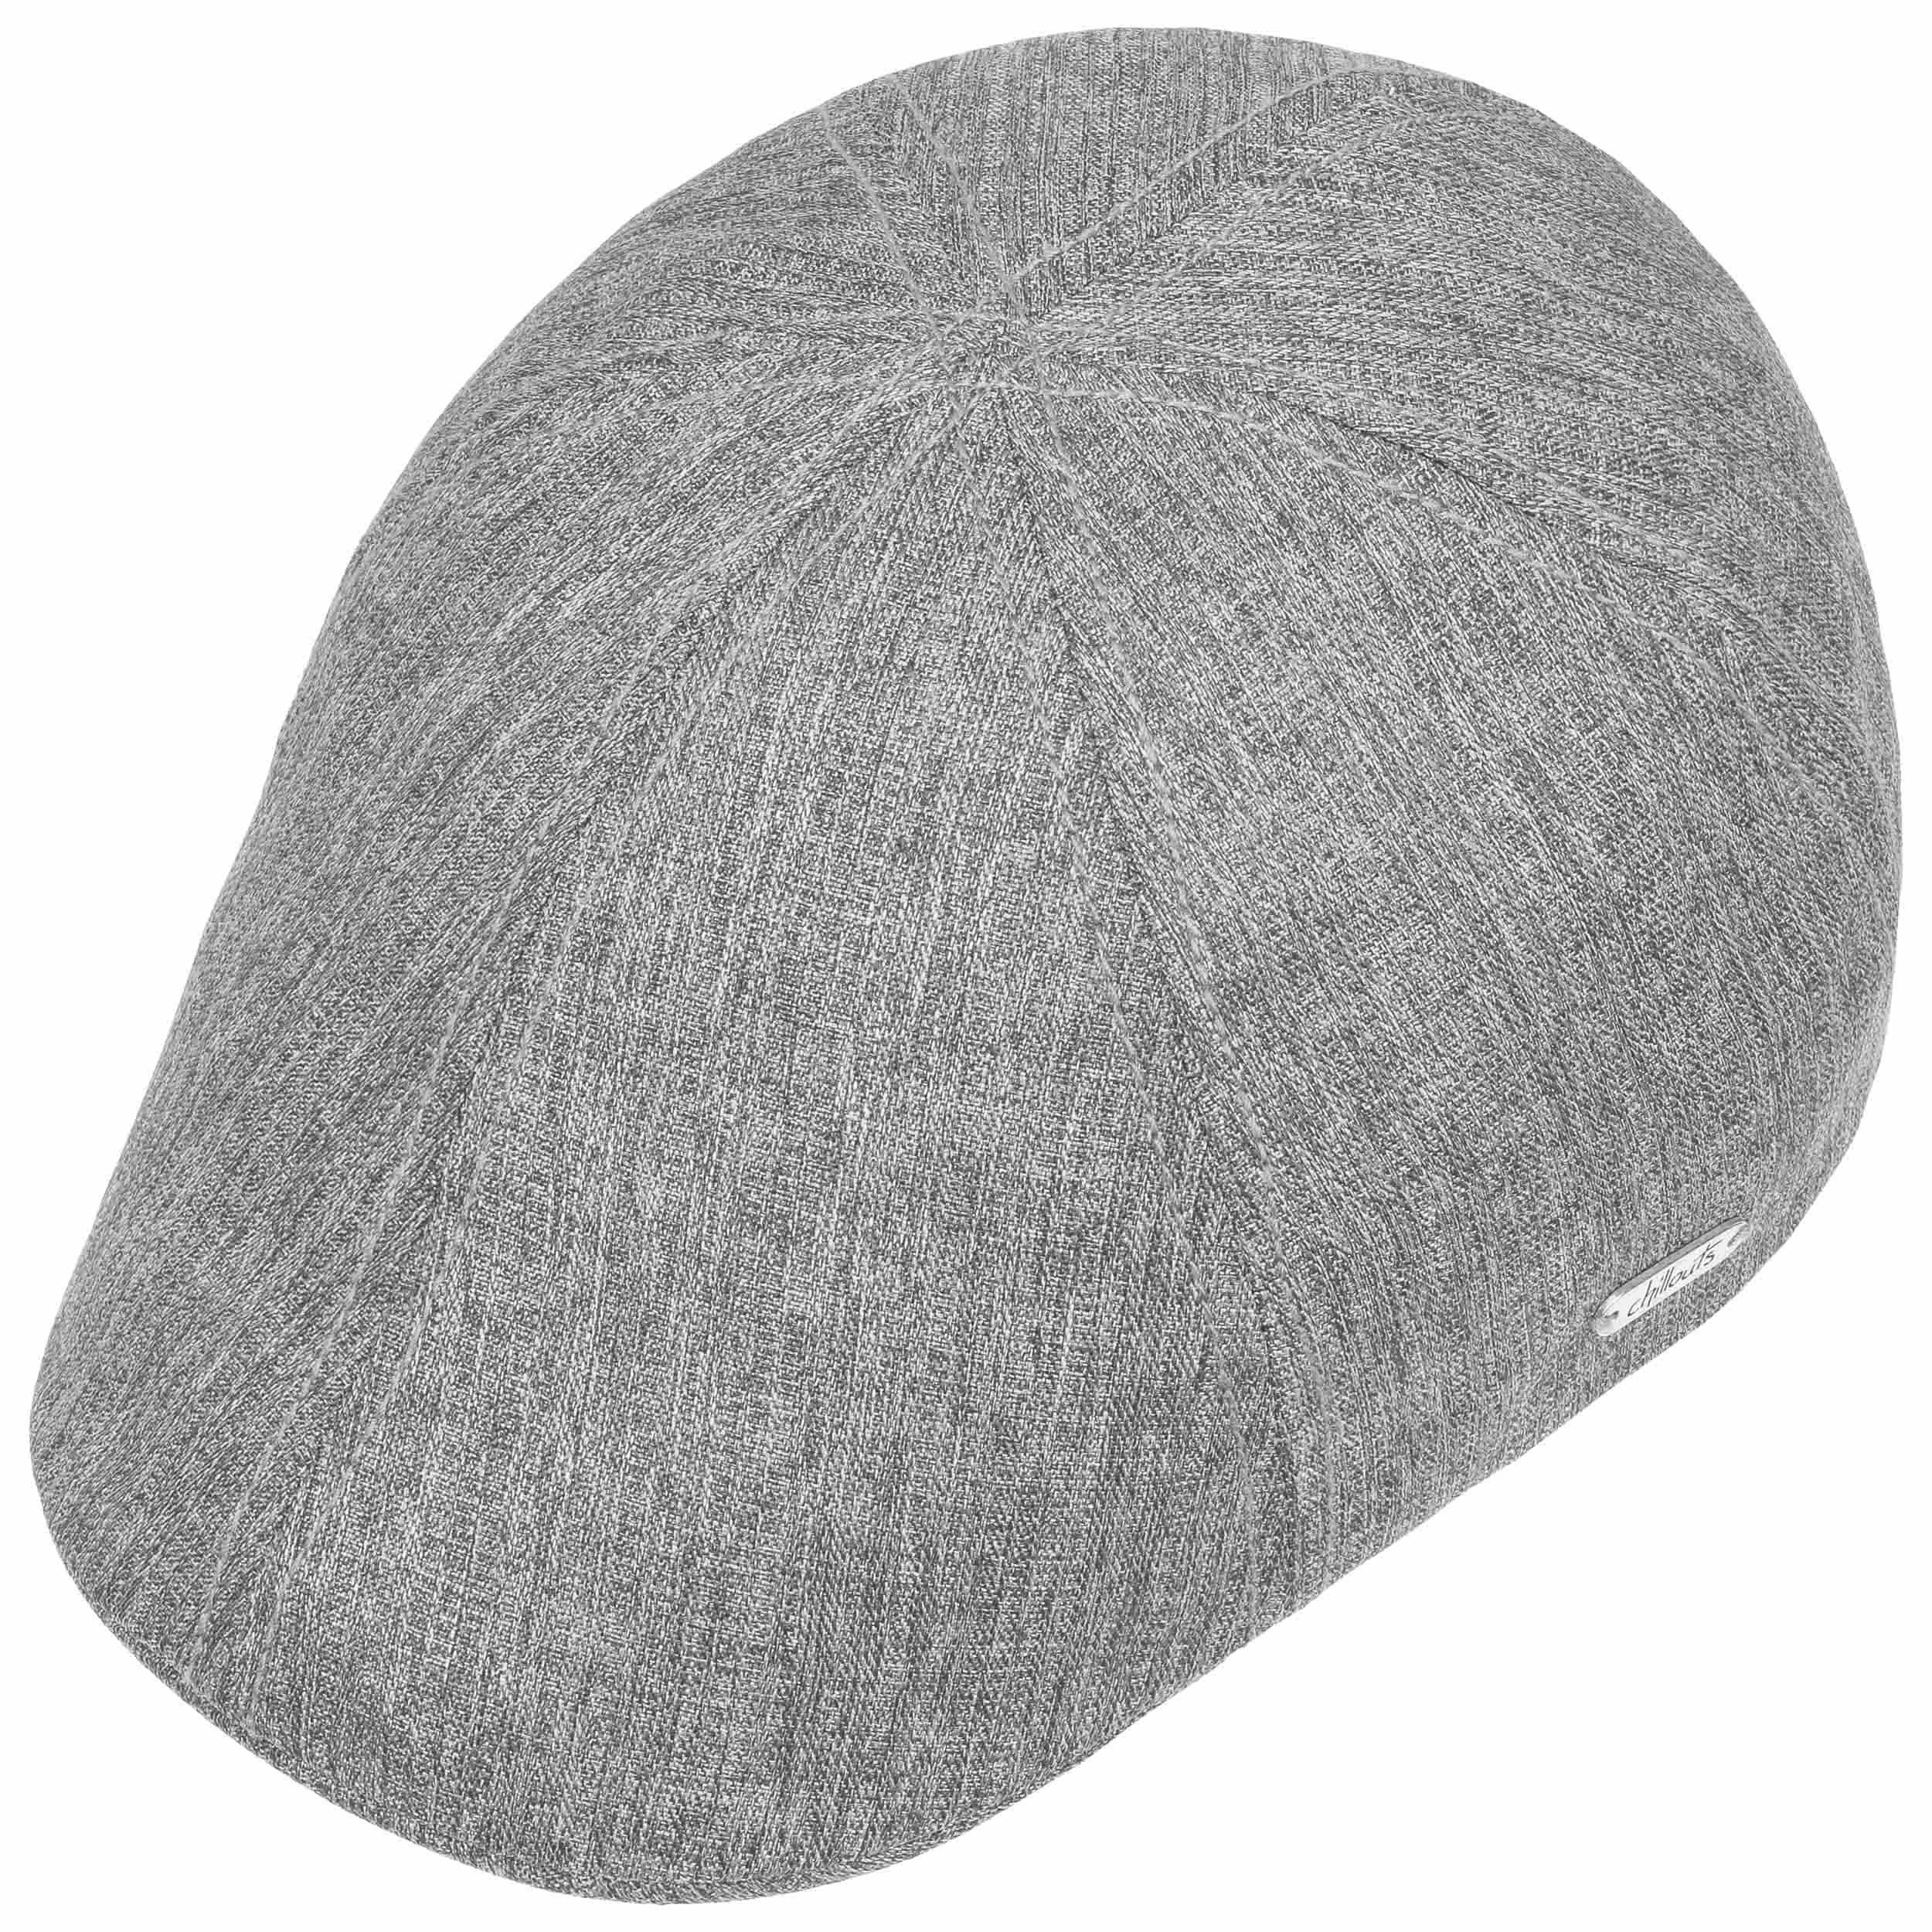 Kids Universal Wool Blend Flat Brim Elastic Back Hat Cap Beanie NEW!